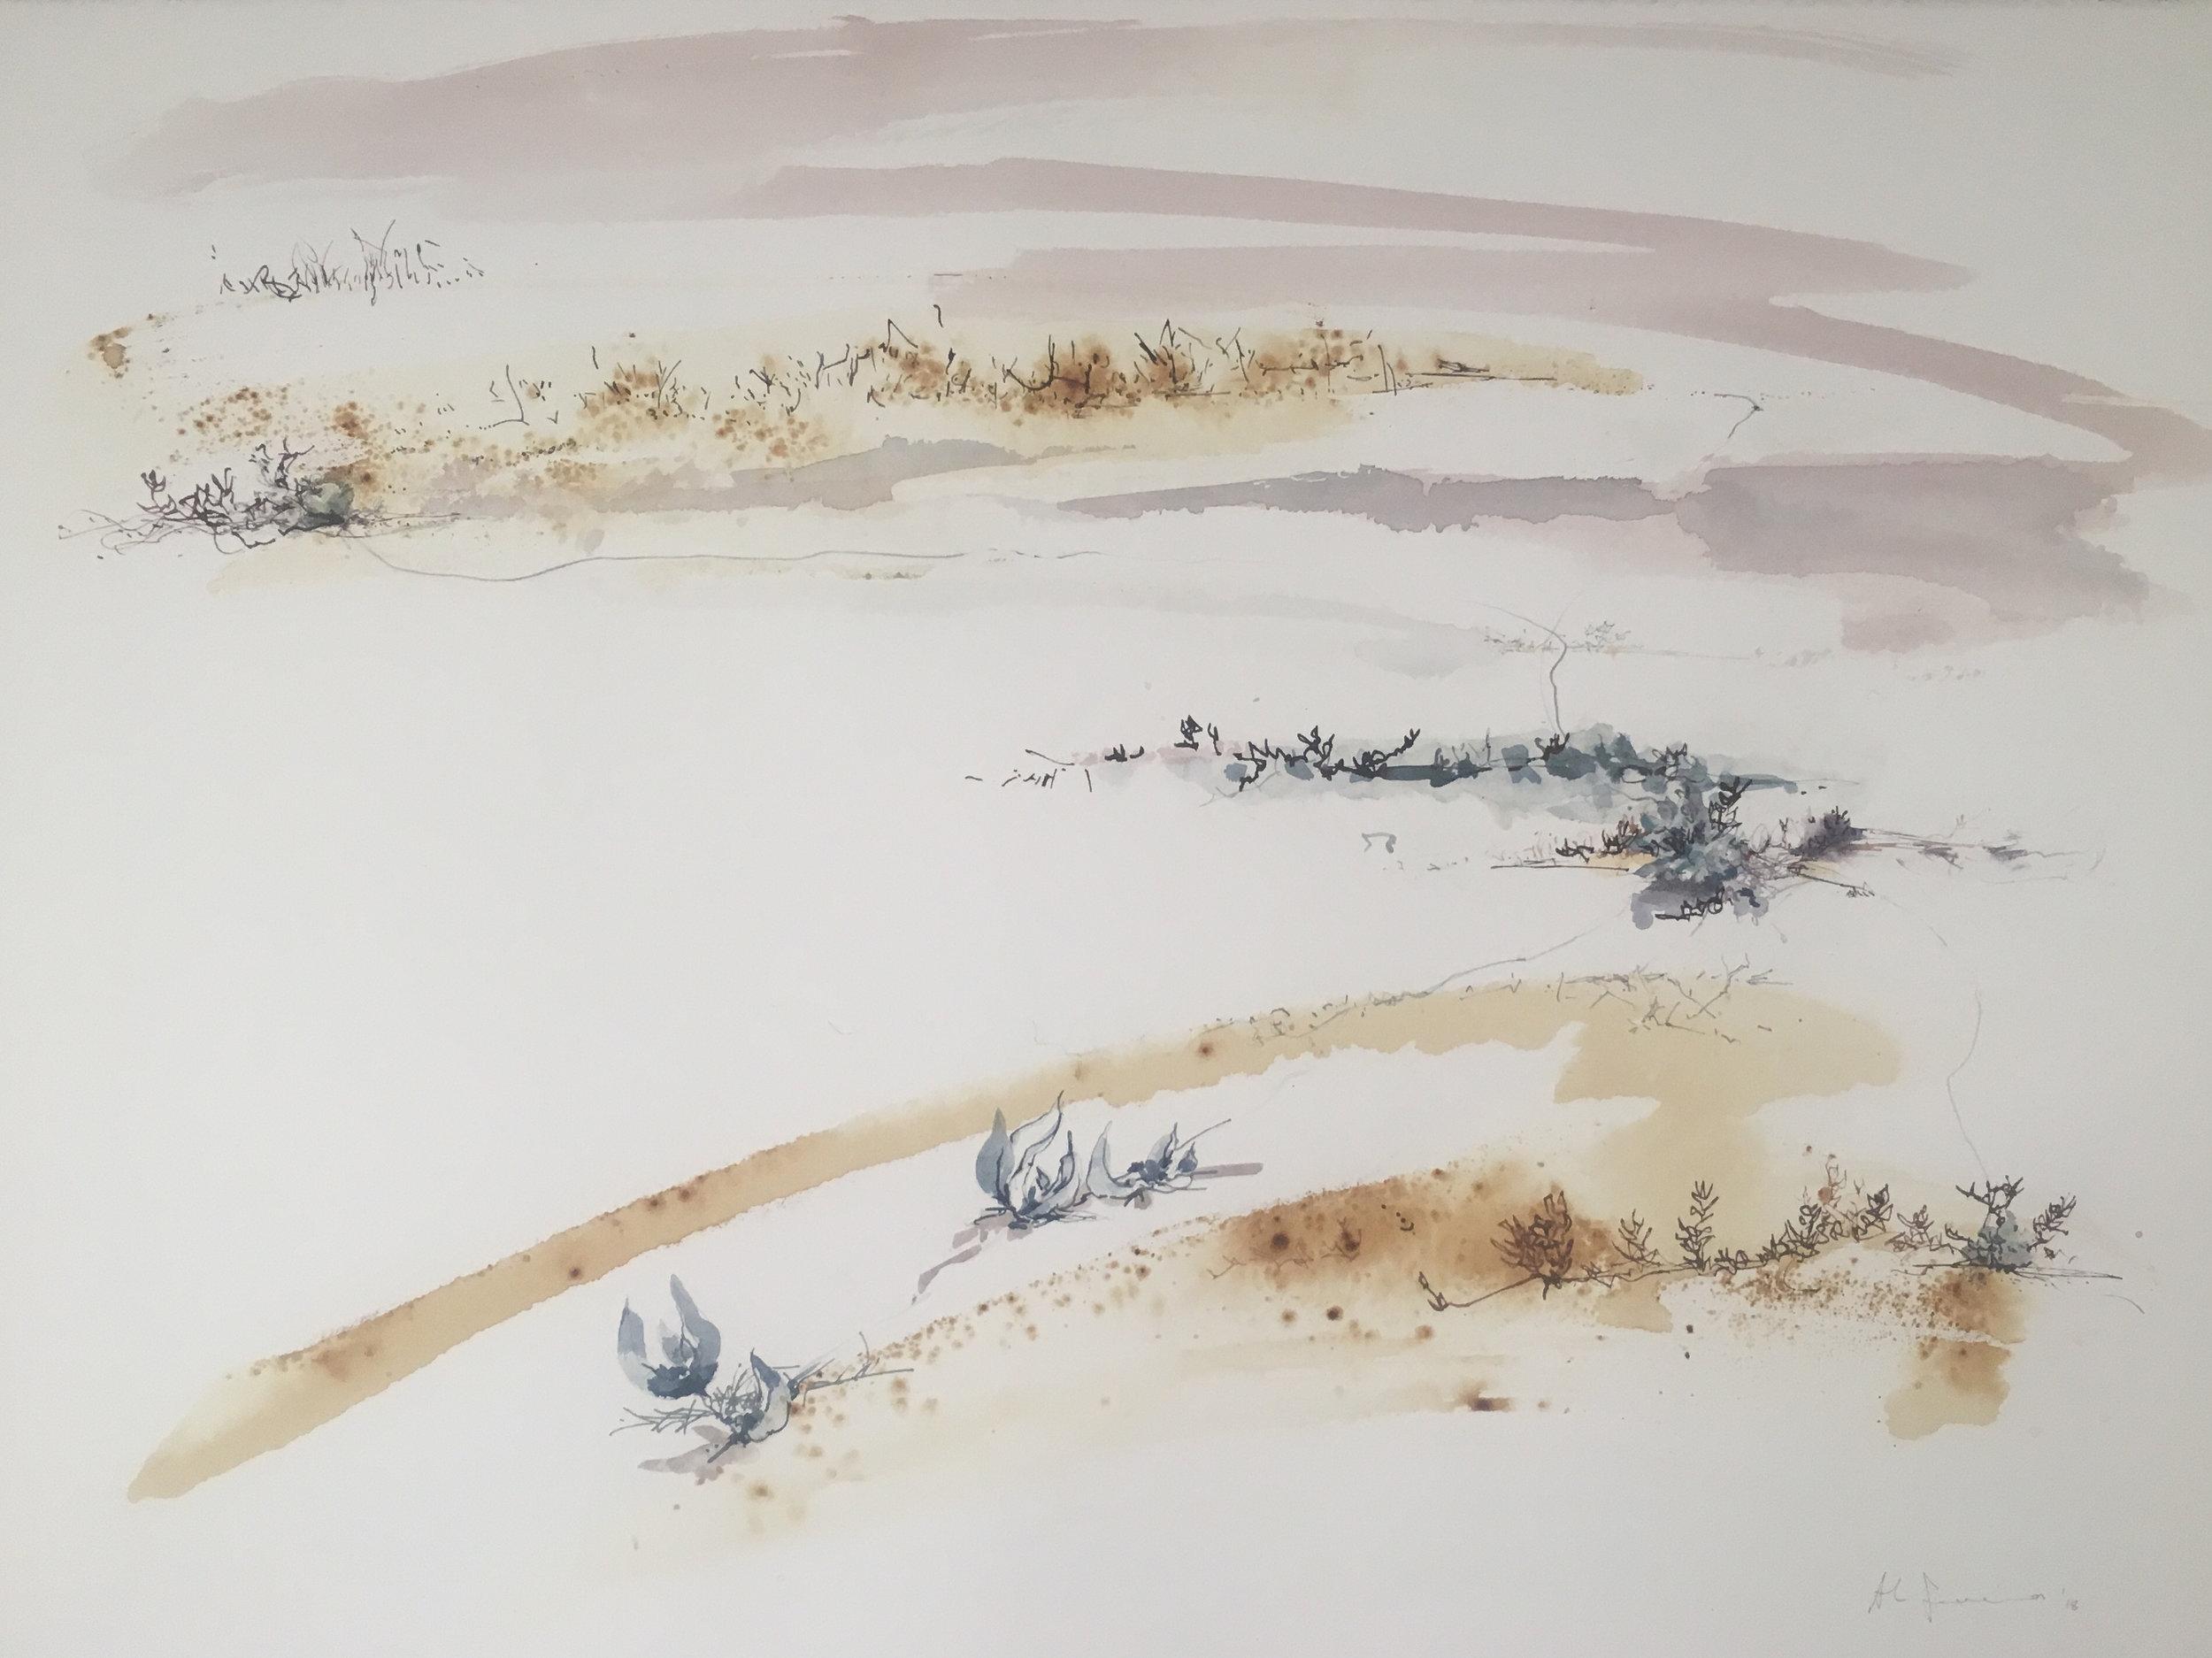 Mandy FerreiraI_Dirk Hartog Island1_2018_Watercolours pencil on paper_990x800cm. .jpg